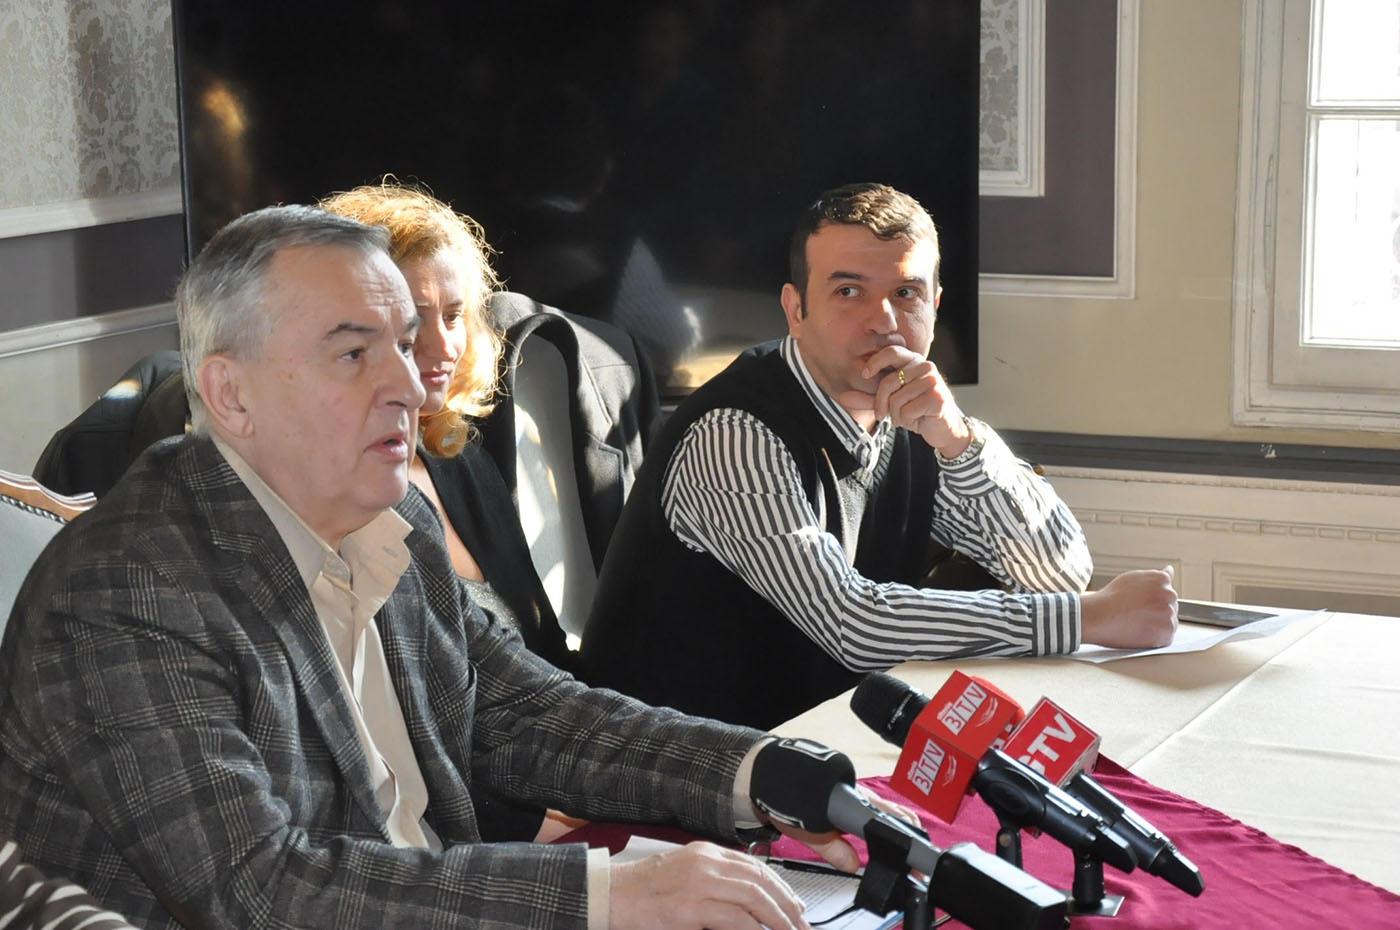 APS s-a întâlnit la Craiova cu tinerii jurnaliști sportivi